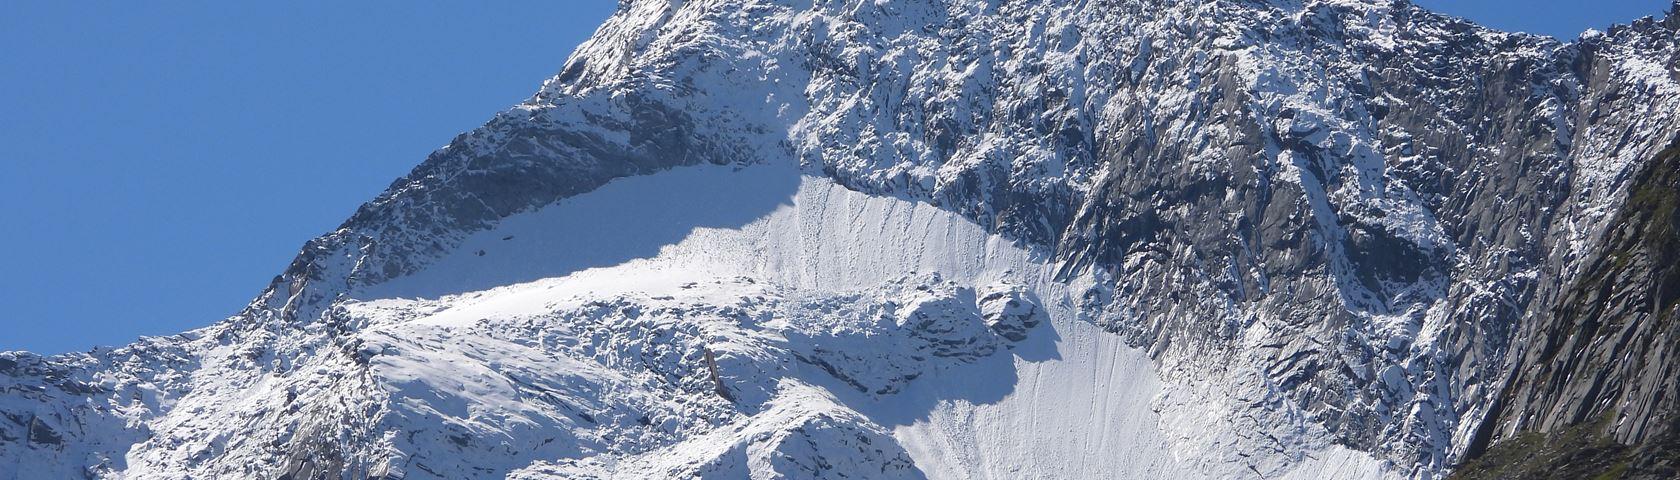 Mountain in Austria Zillertal